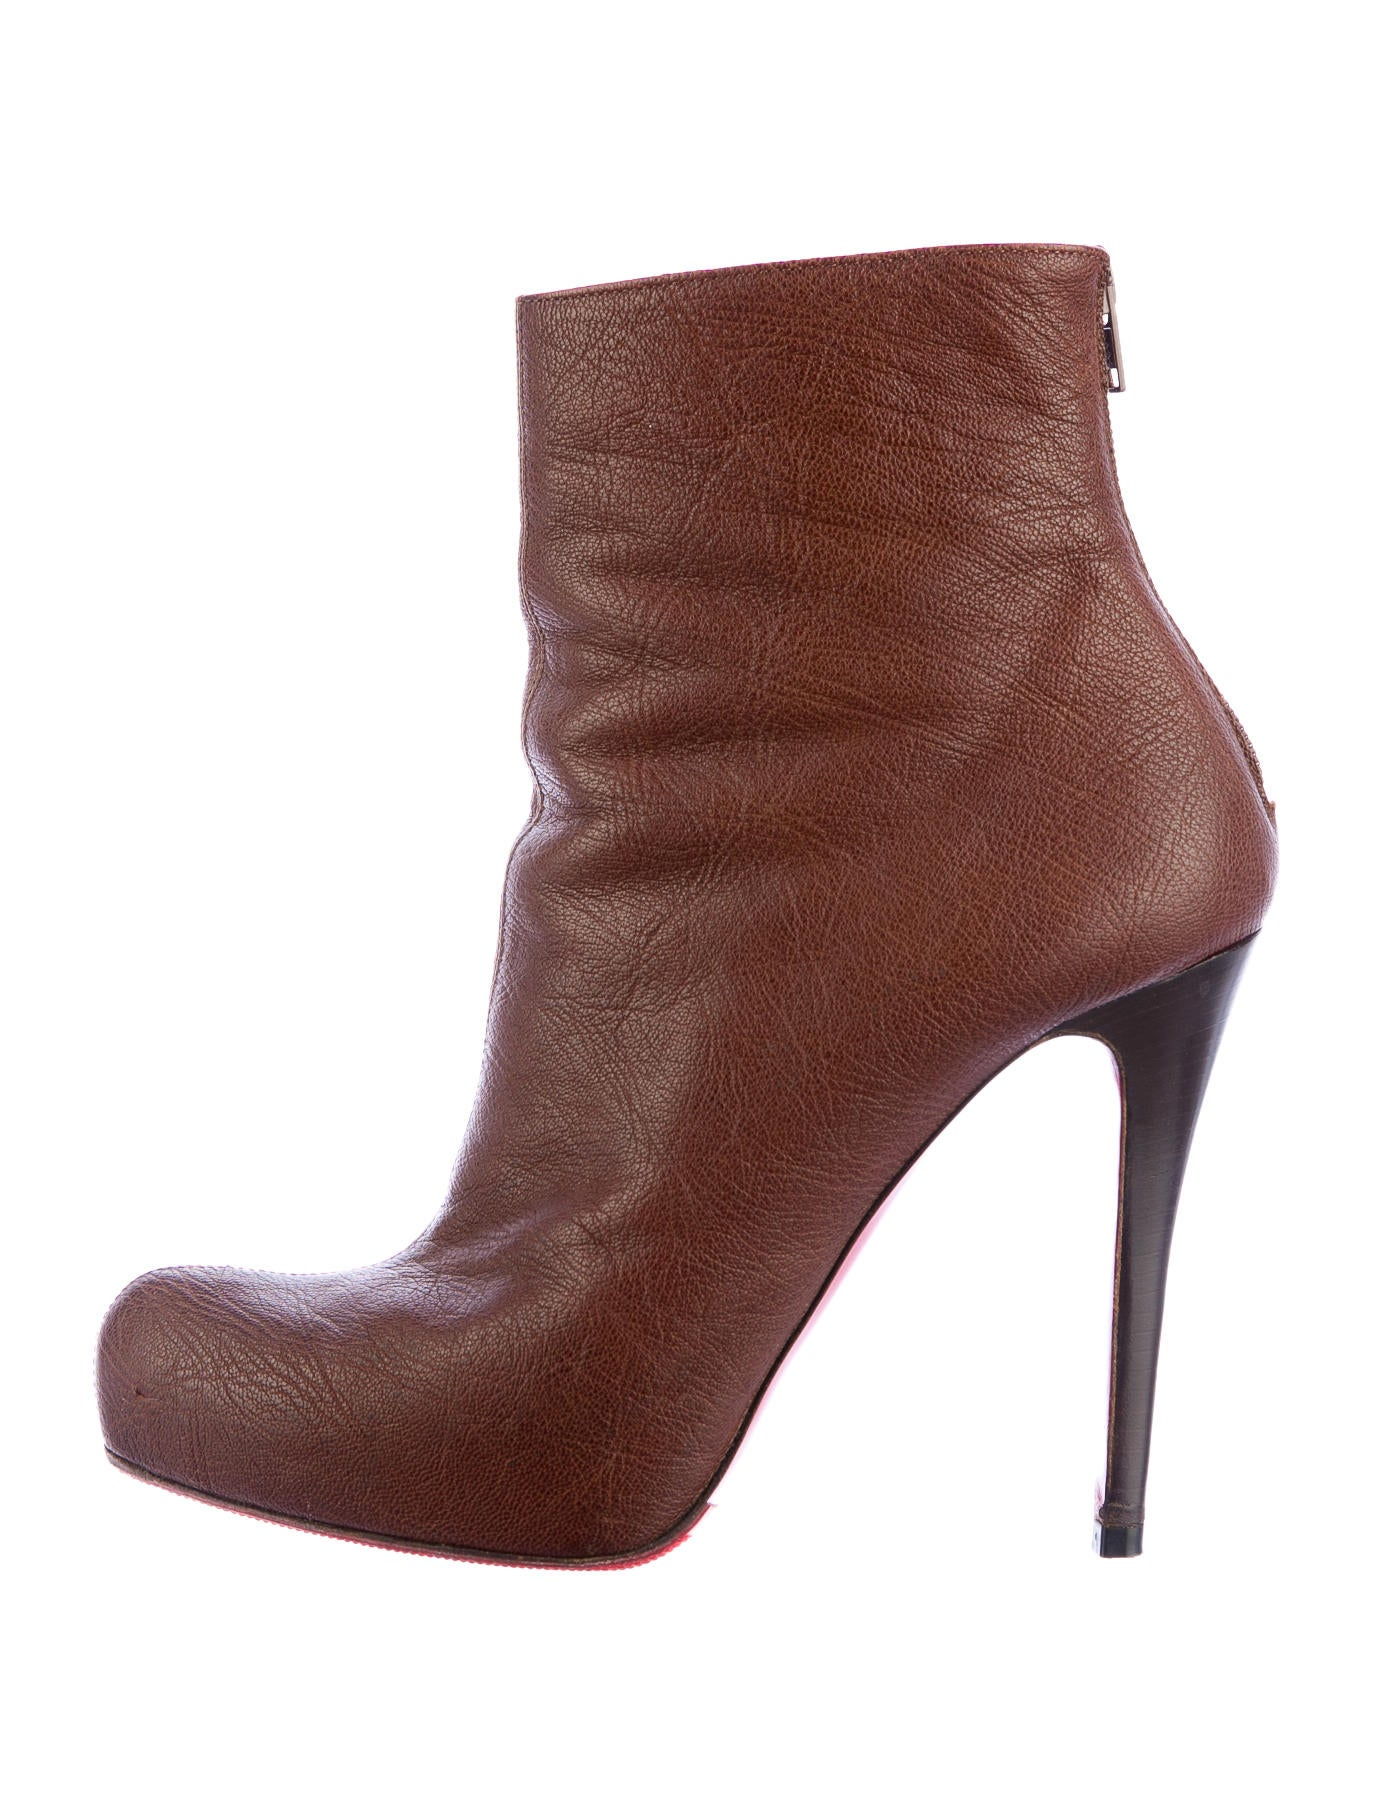 nouvelle arrivee 4bdfa f32e7 Christian Louboutin Arielle A Talon Boots - Shoes - CHT30050 ...